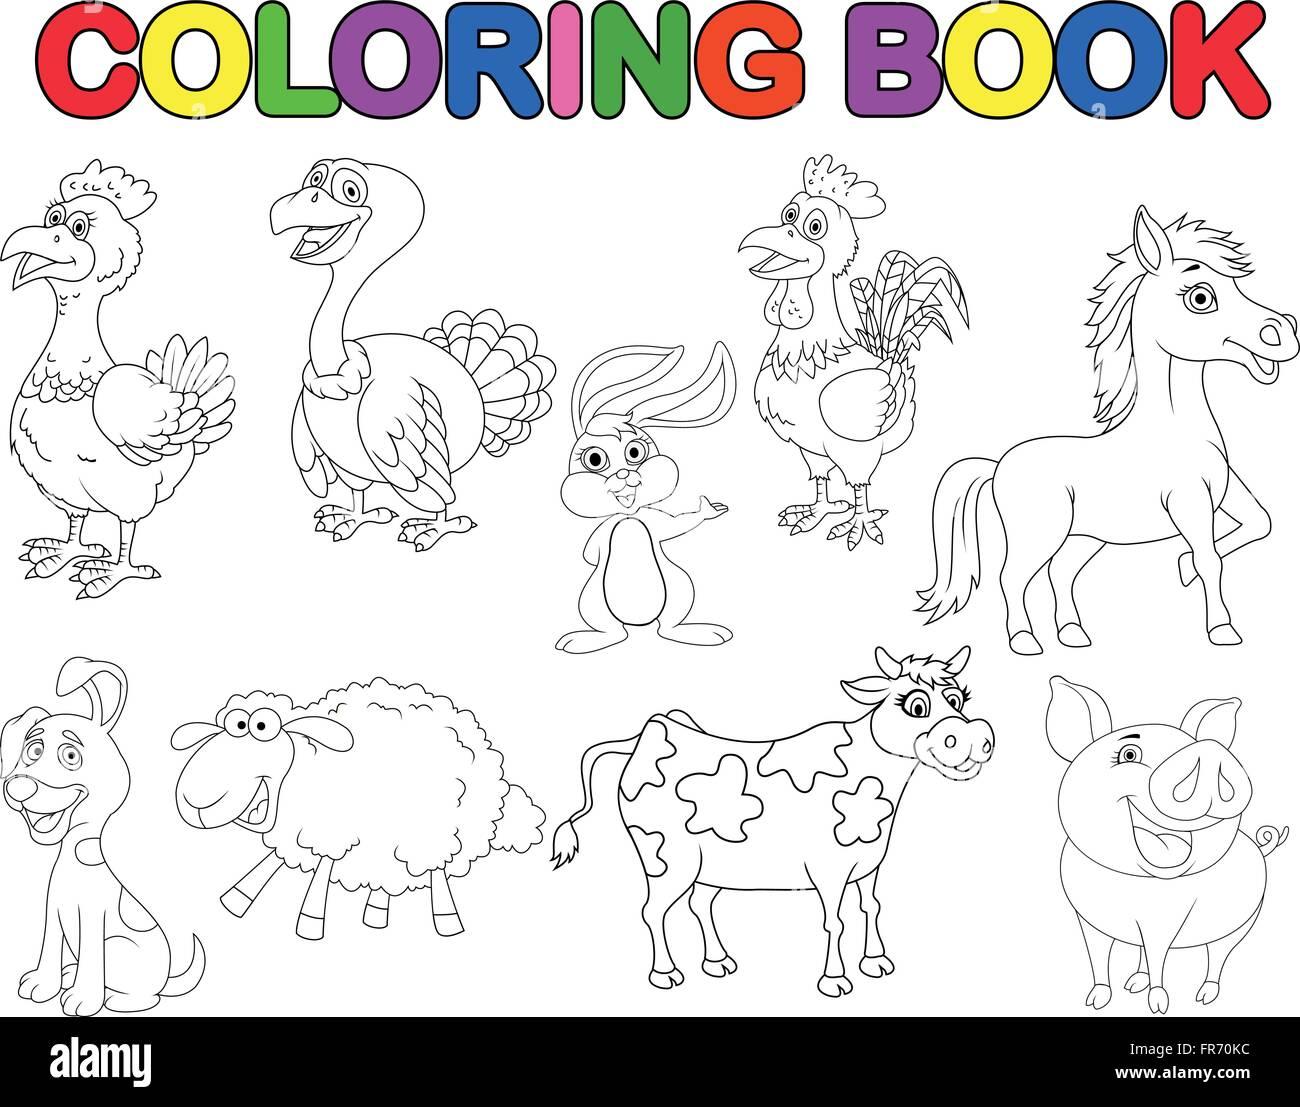 - Farm Animal Coloring Book Stock Vector Art & Illustration, Vector